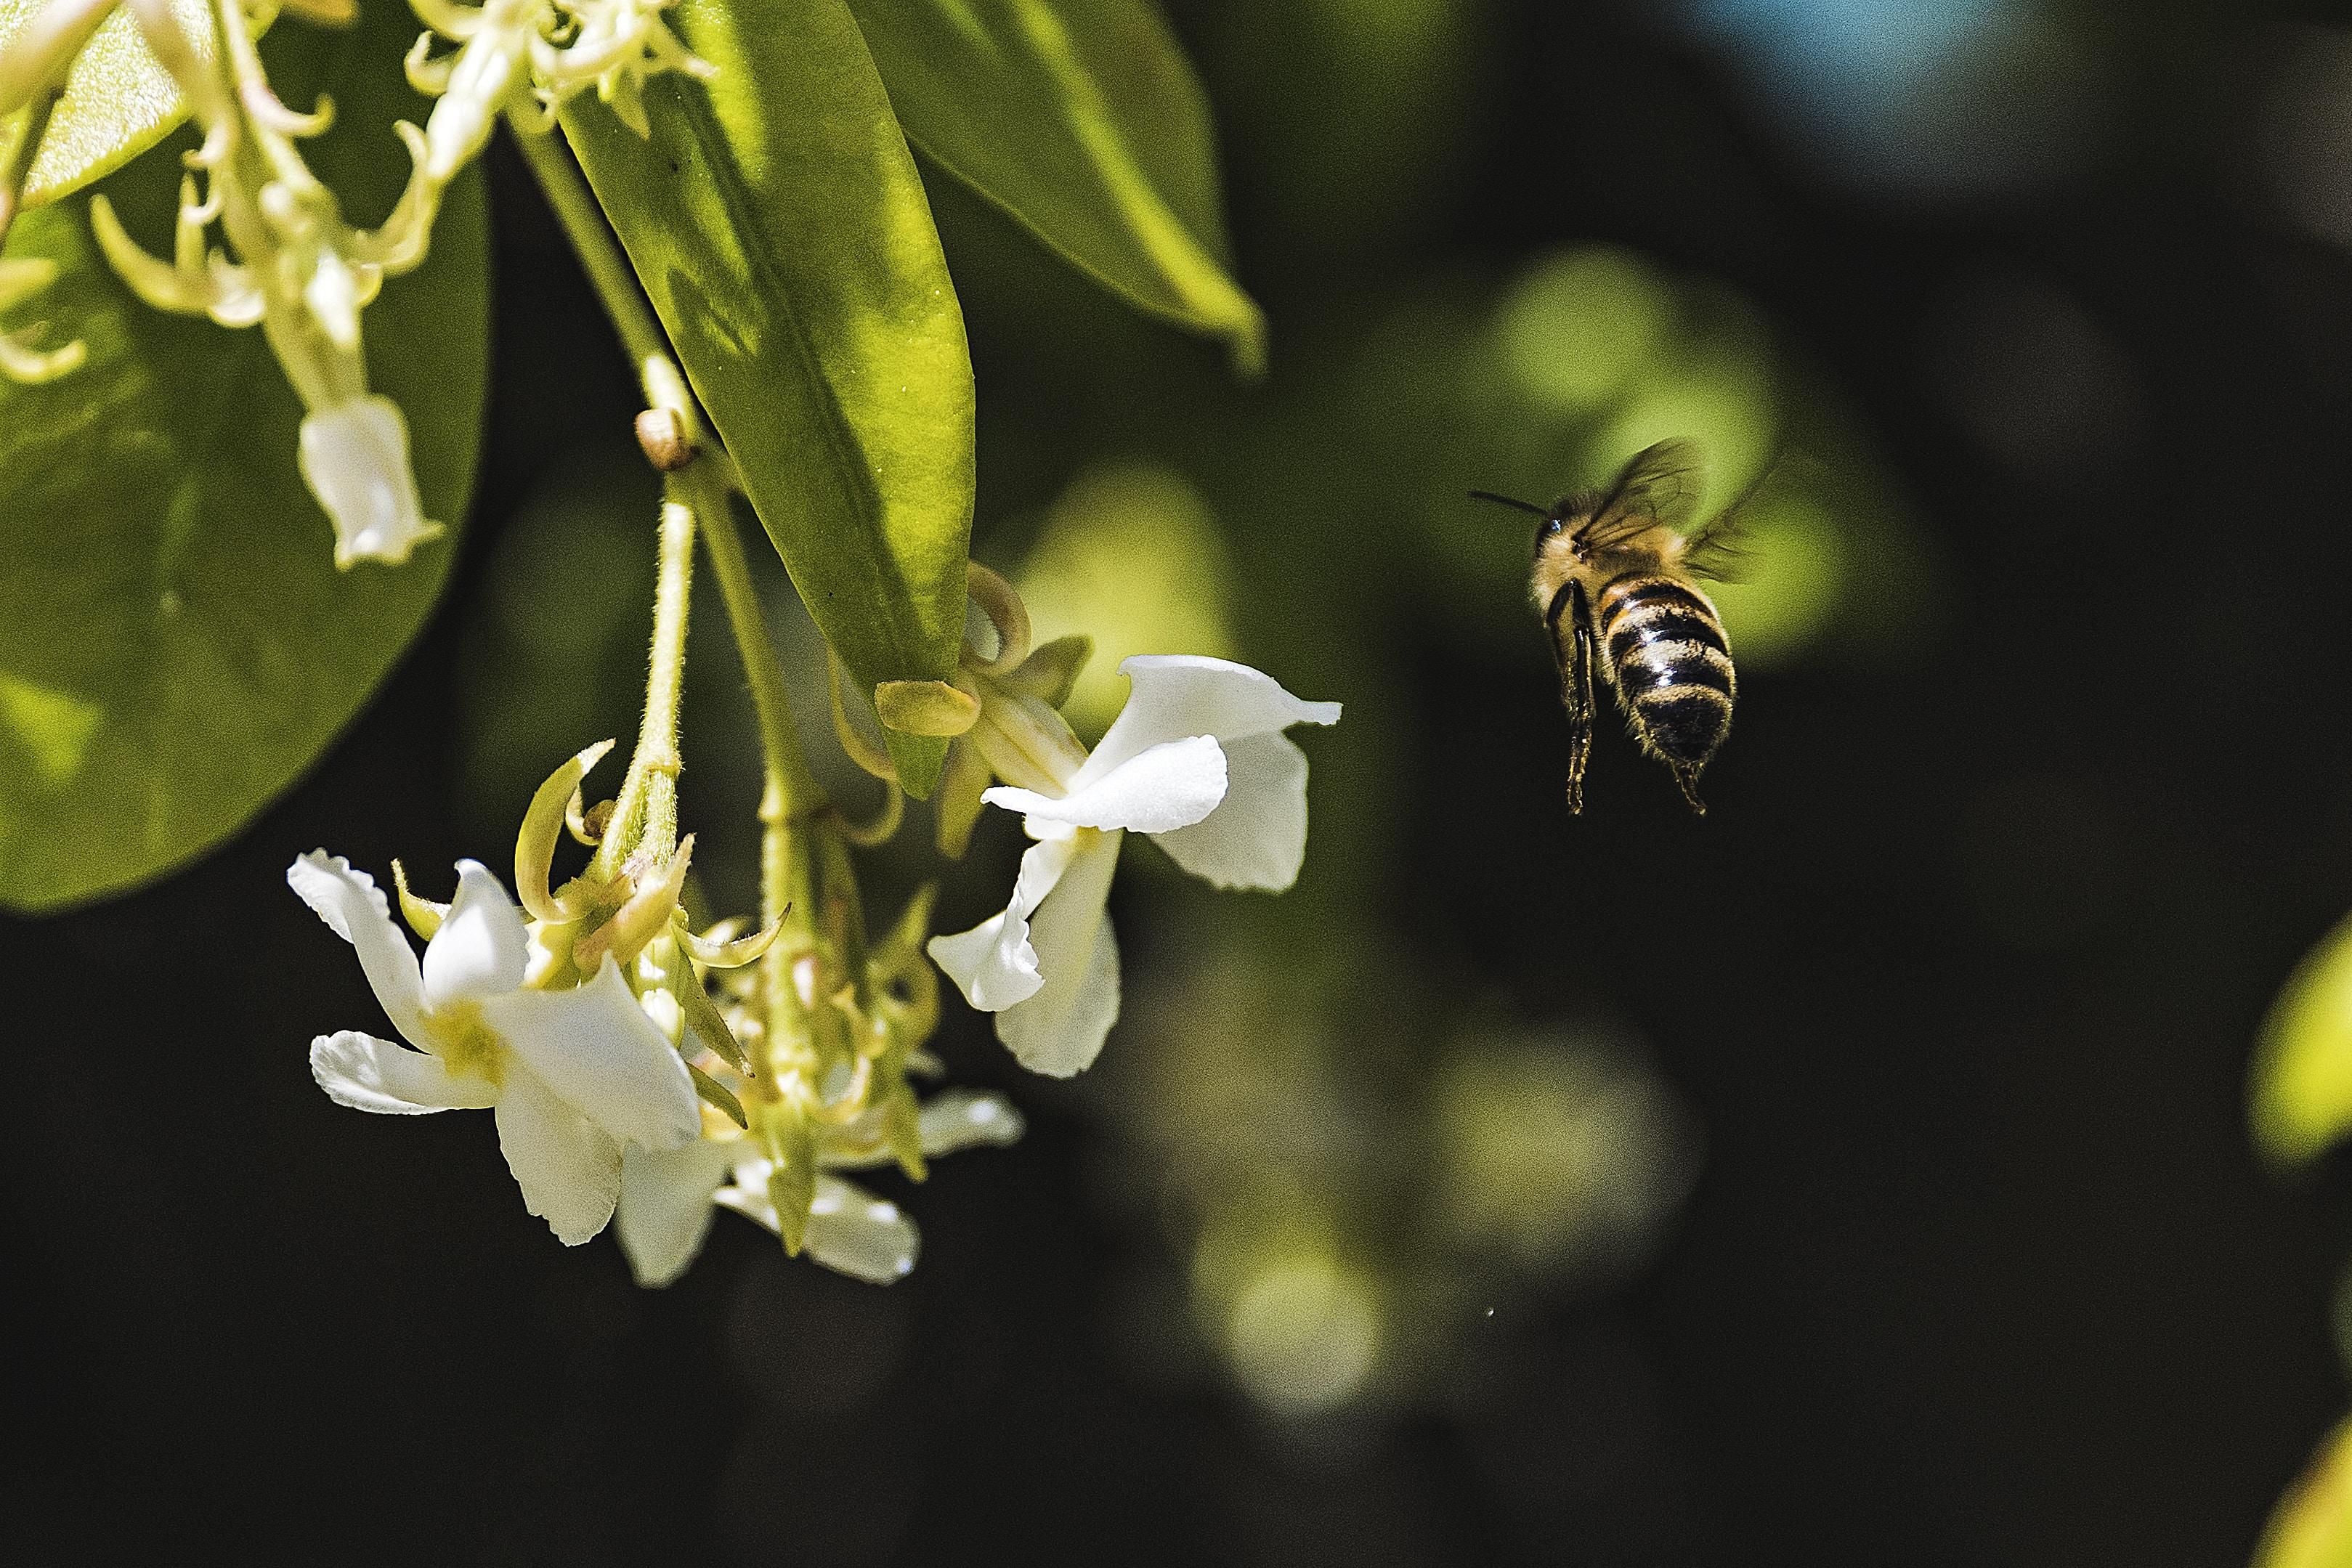 bumblebee flying beside white flowers